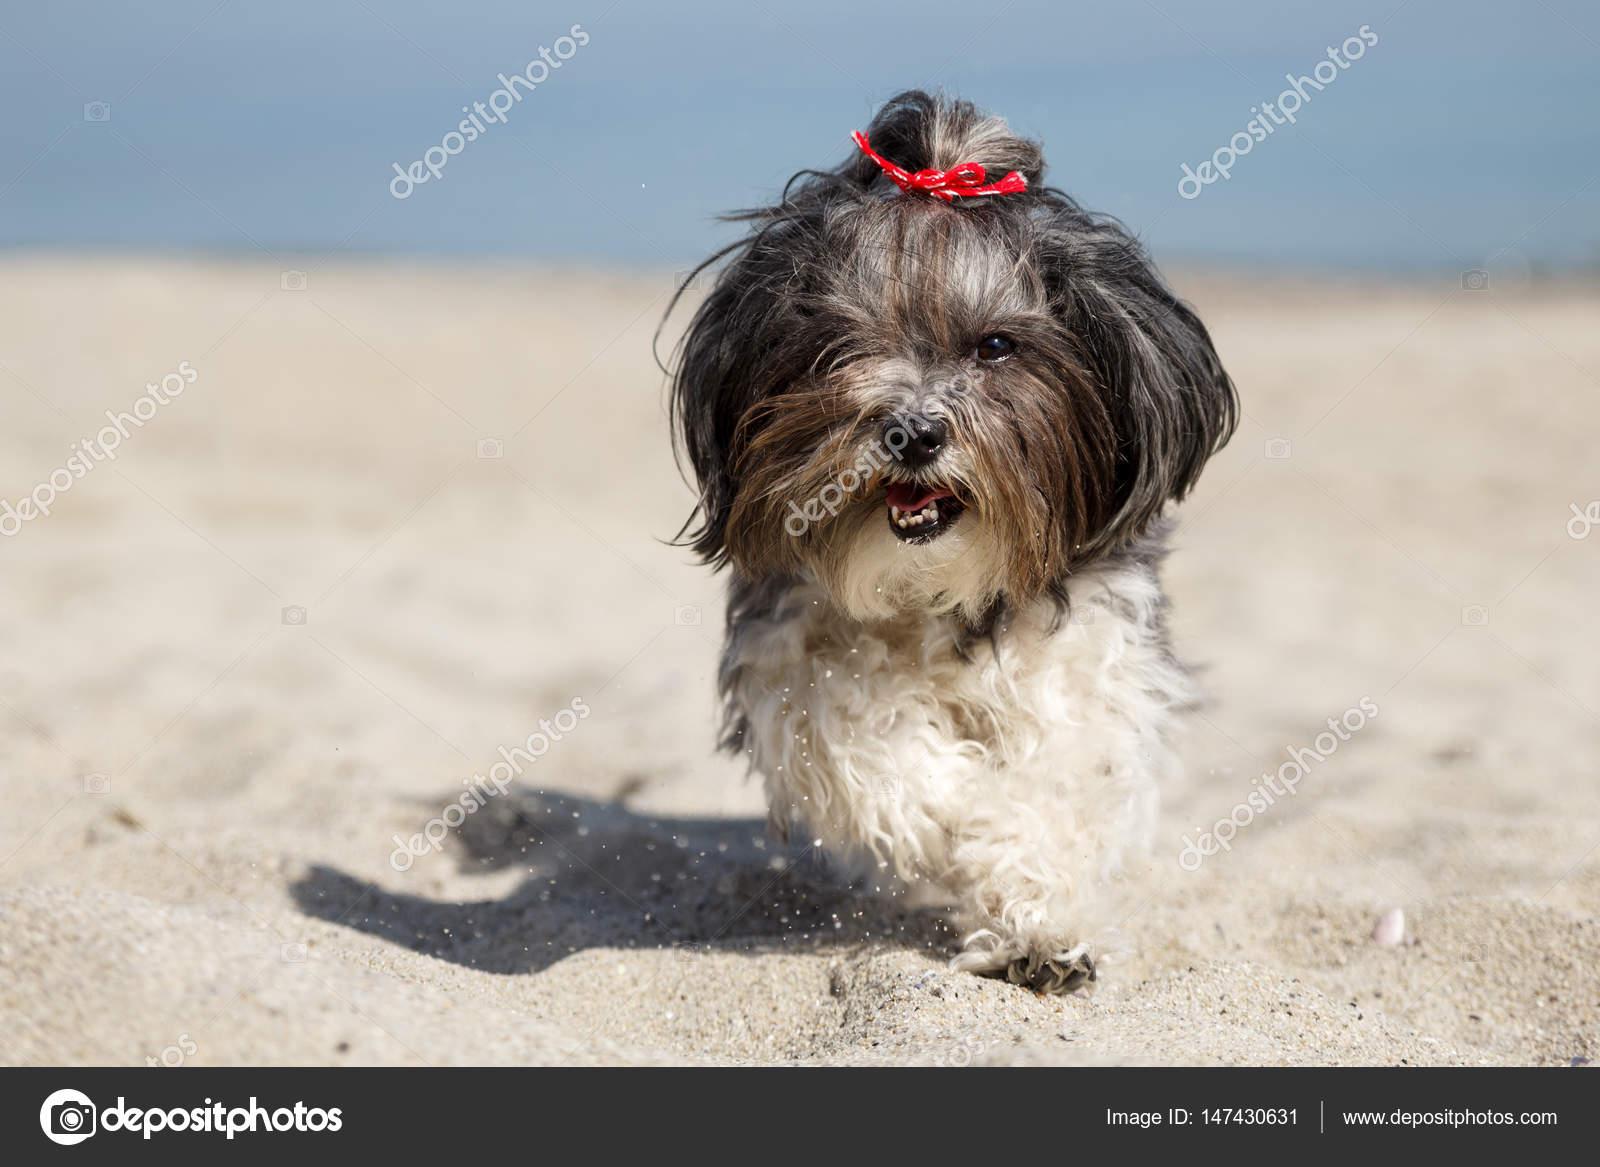 Cute Dog Running Happily On The Beach Stock Photo C Mahlebashieva